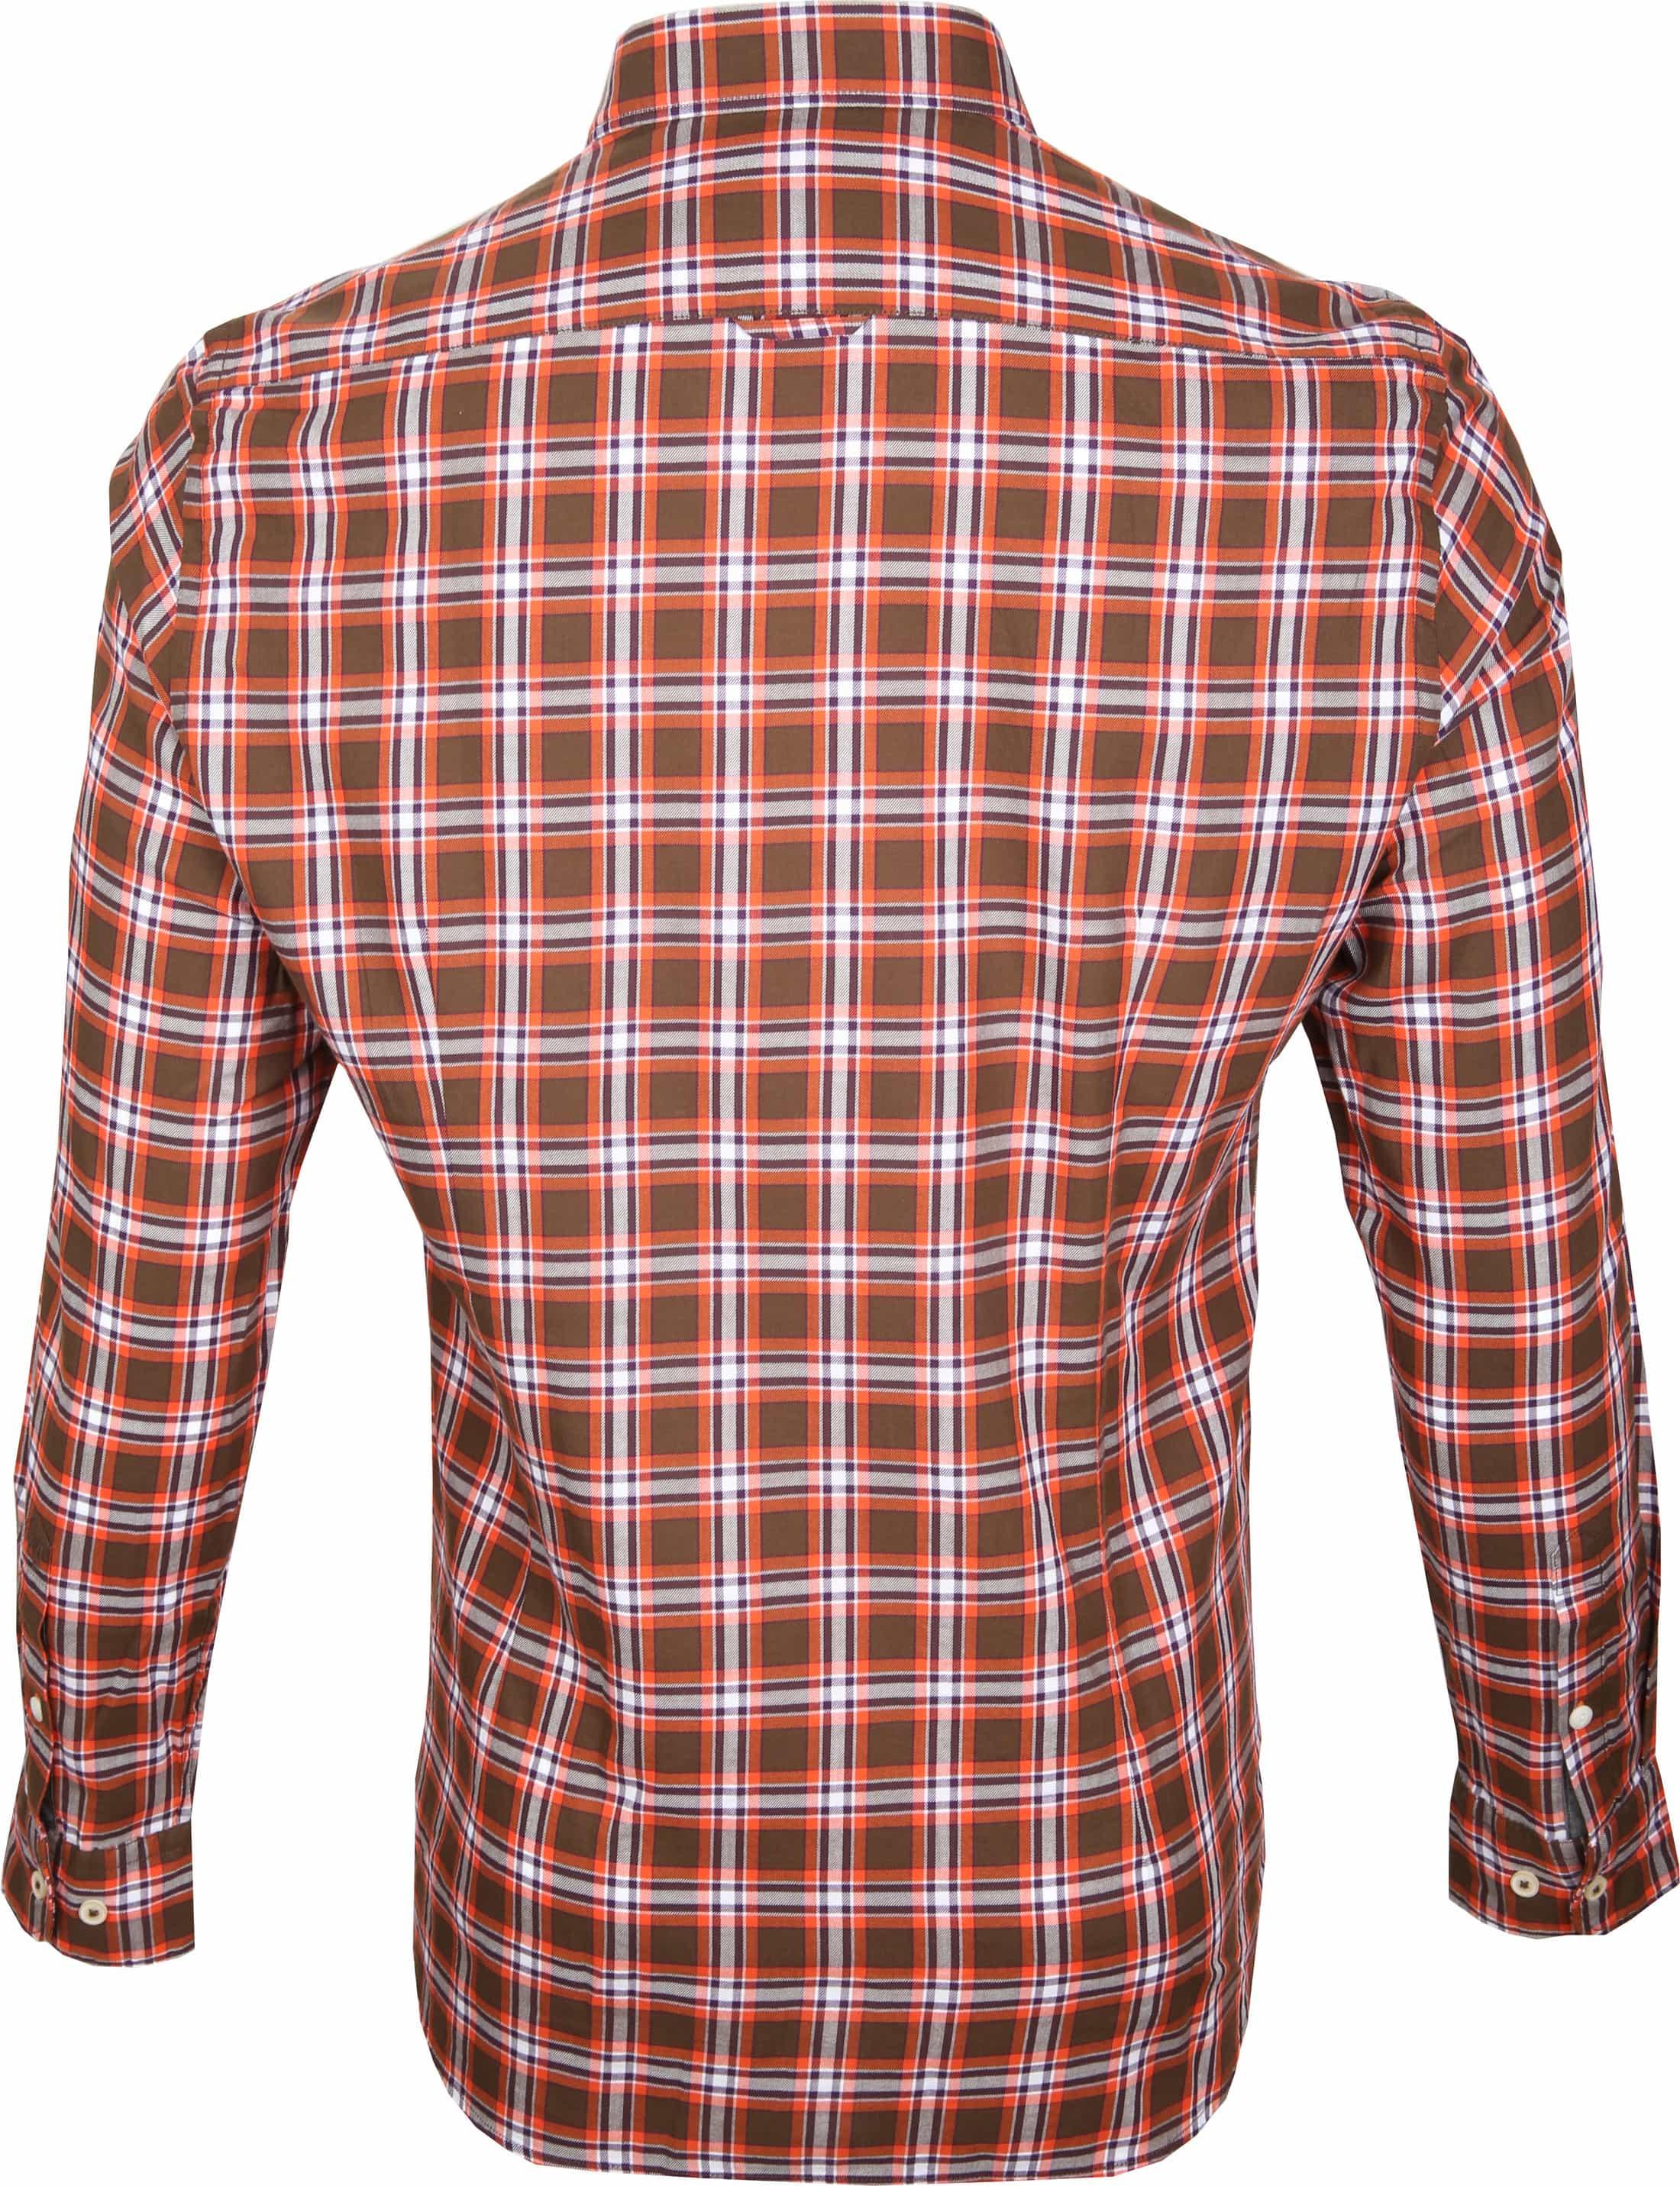 Marc O'Polo Casual Shirt Checks foto 3